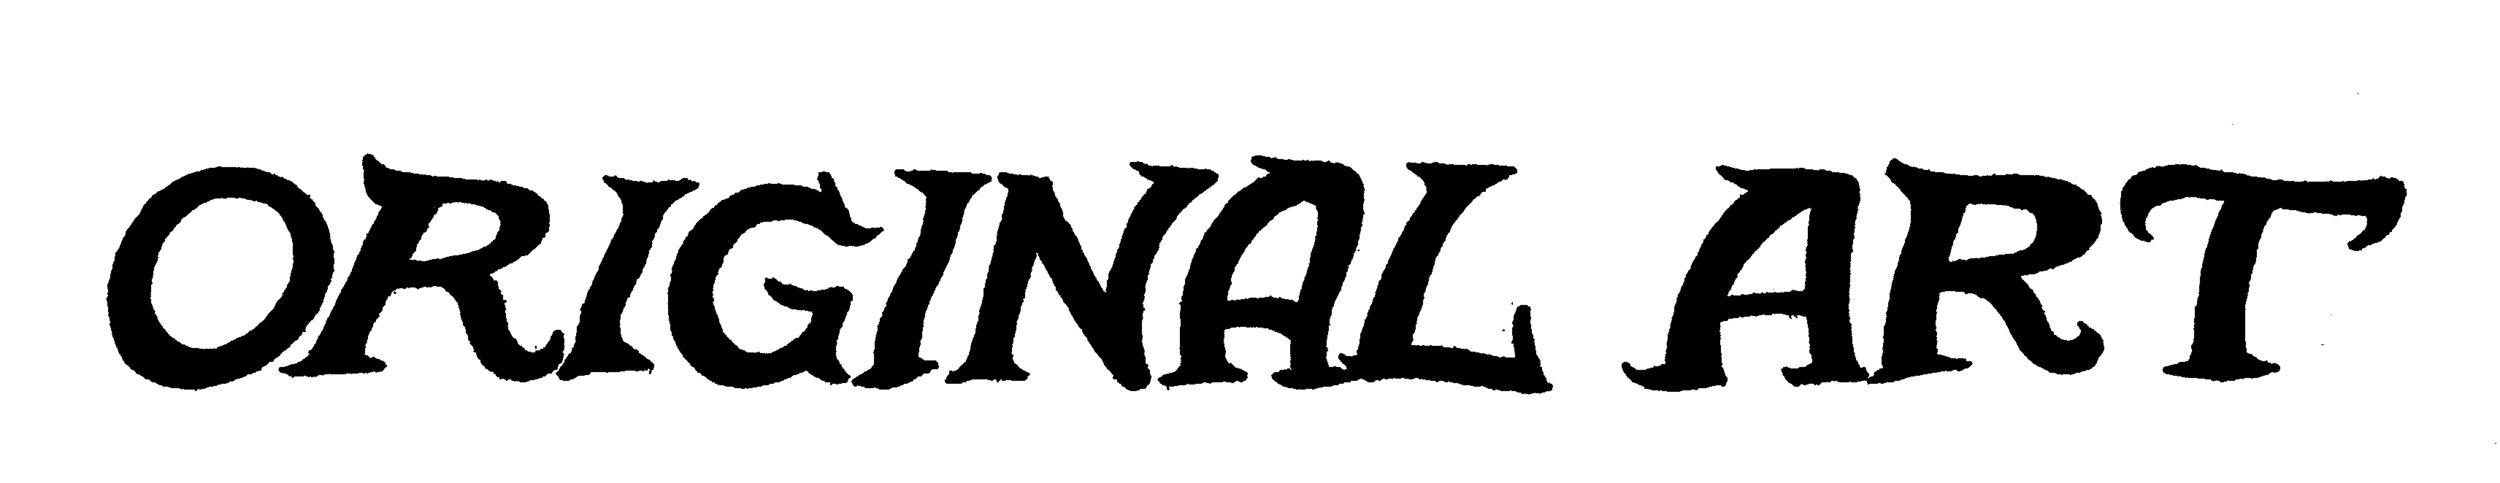 Original Art Logo001.jpg